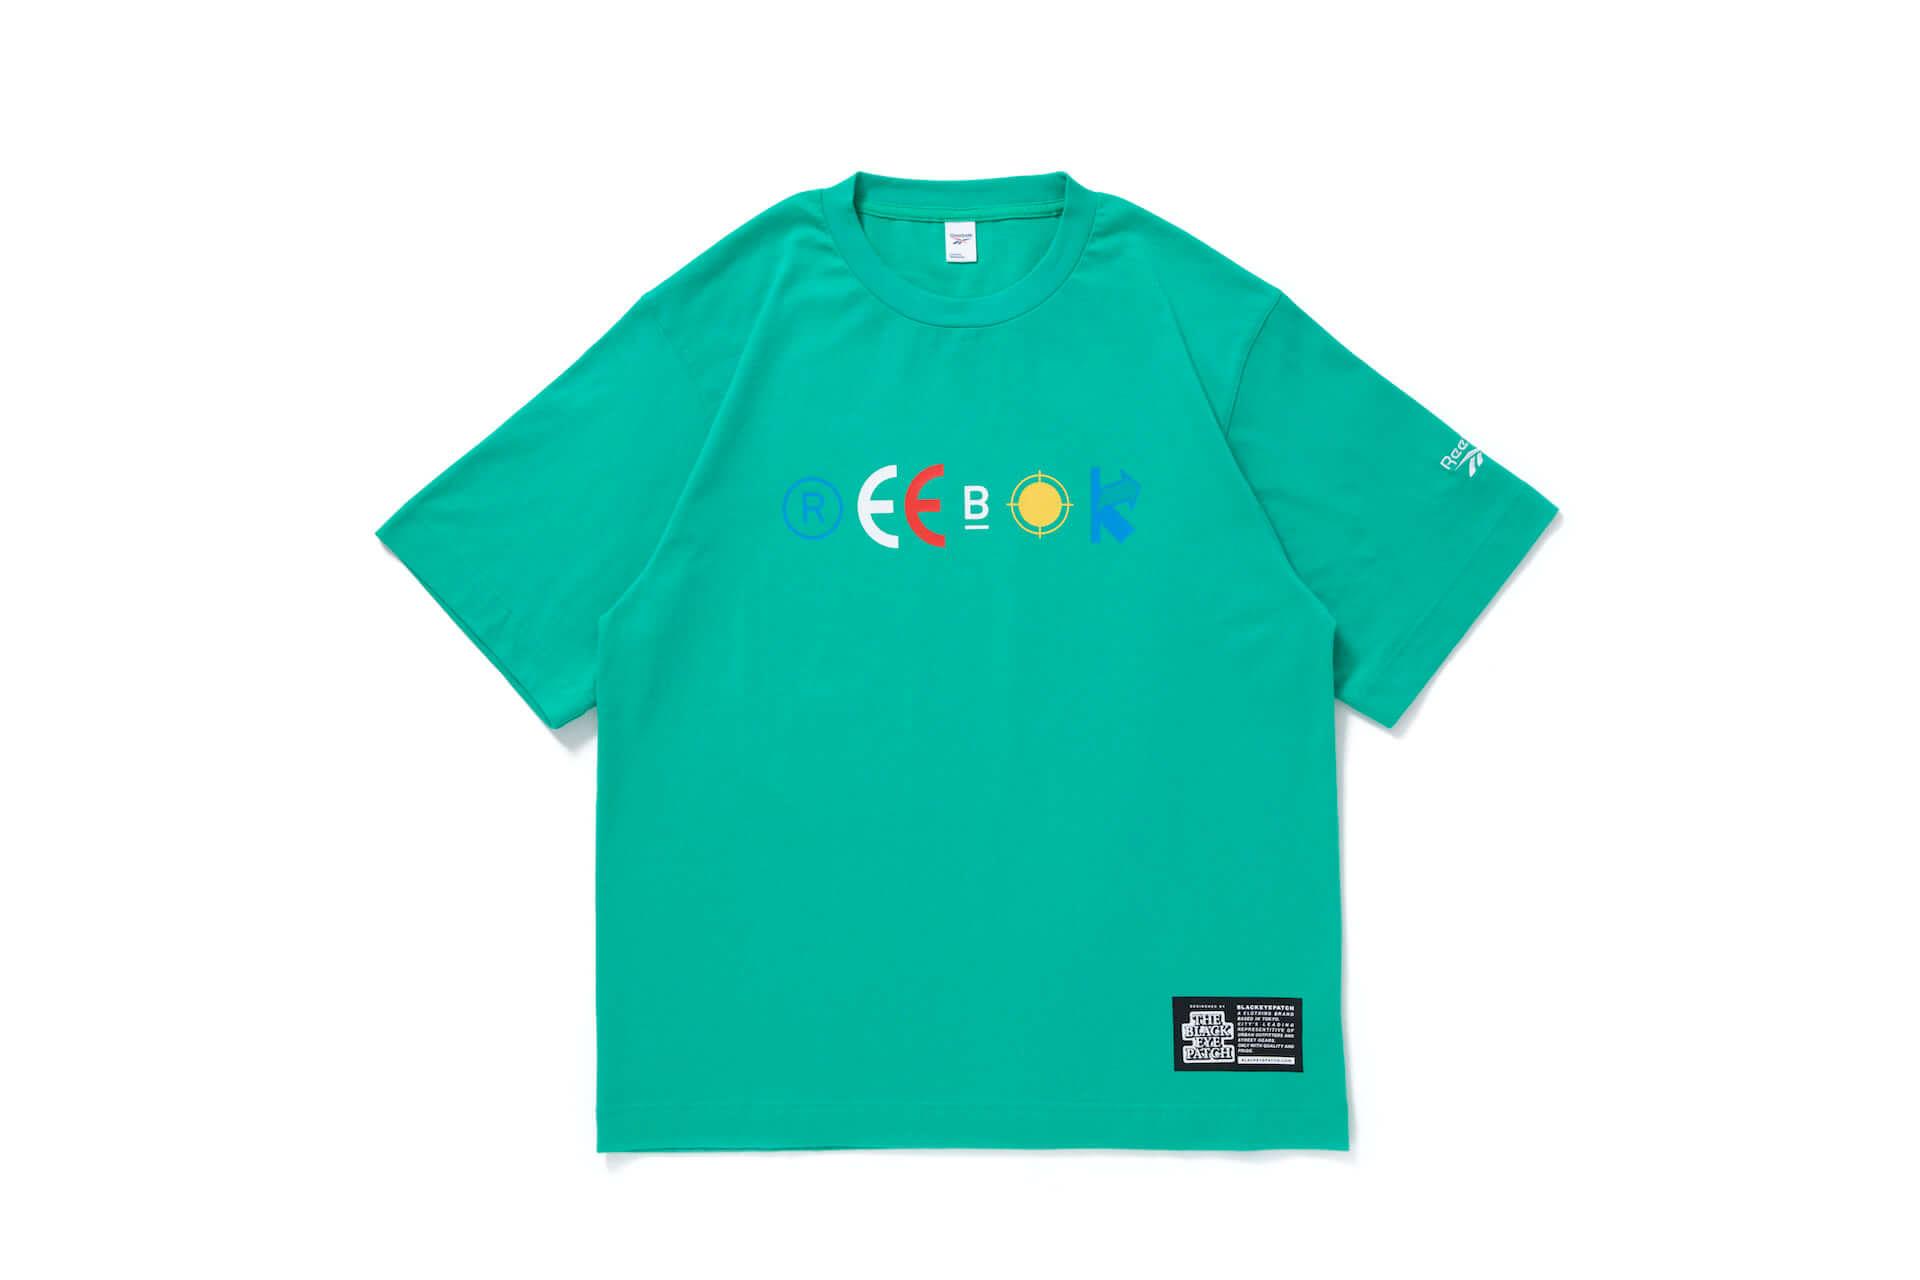 BlackEyePatchがReebokのデザインを再構築!「CLUB C BEP」やTシャツ含むフルコレクションが登場 lf200716_reebok_3-1920x1280